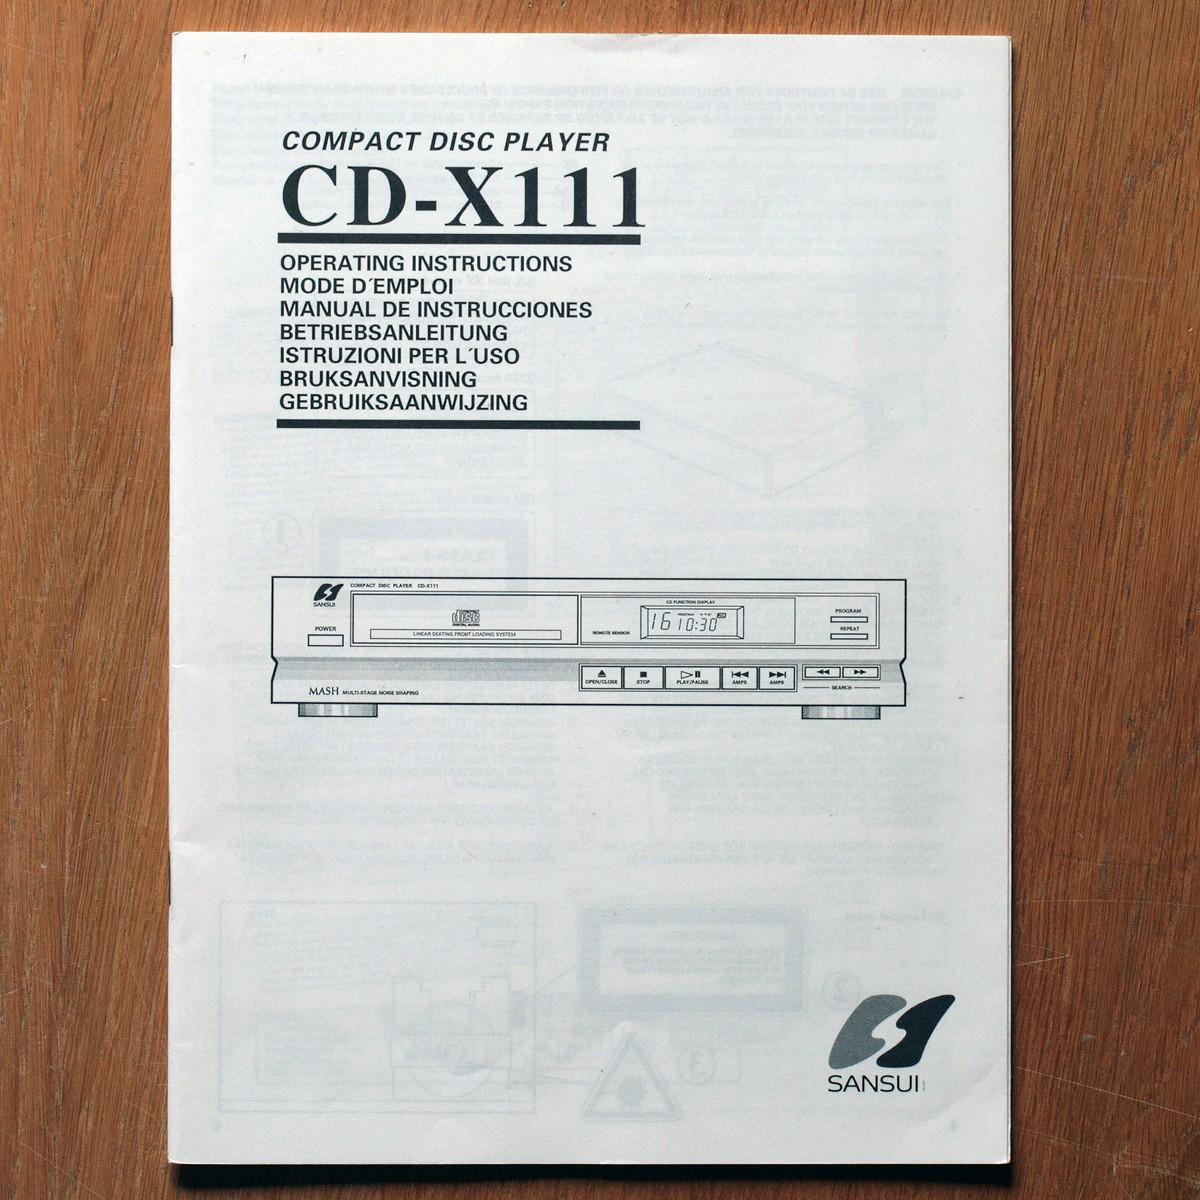 Sansui • Lecteur CD • CD-X111 • Manuel utilisateur • User manual • Bedienungsanleitung • Manual de instrucciones • Instruzioni per l'uso